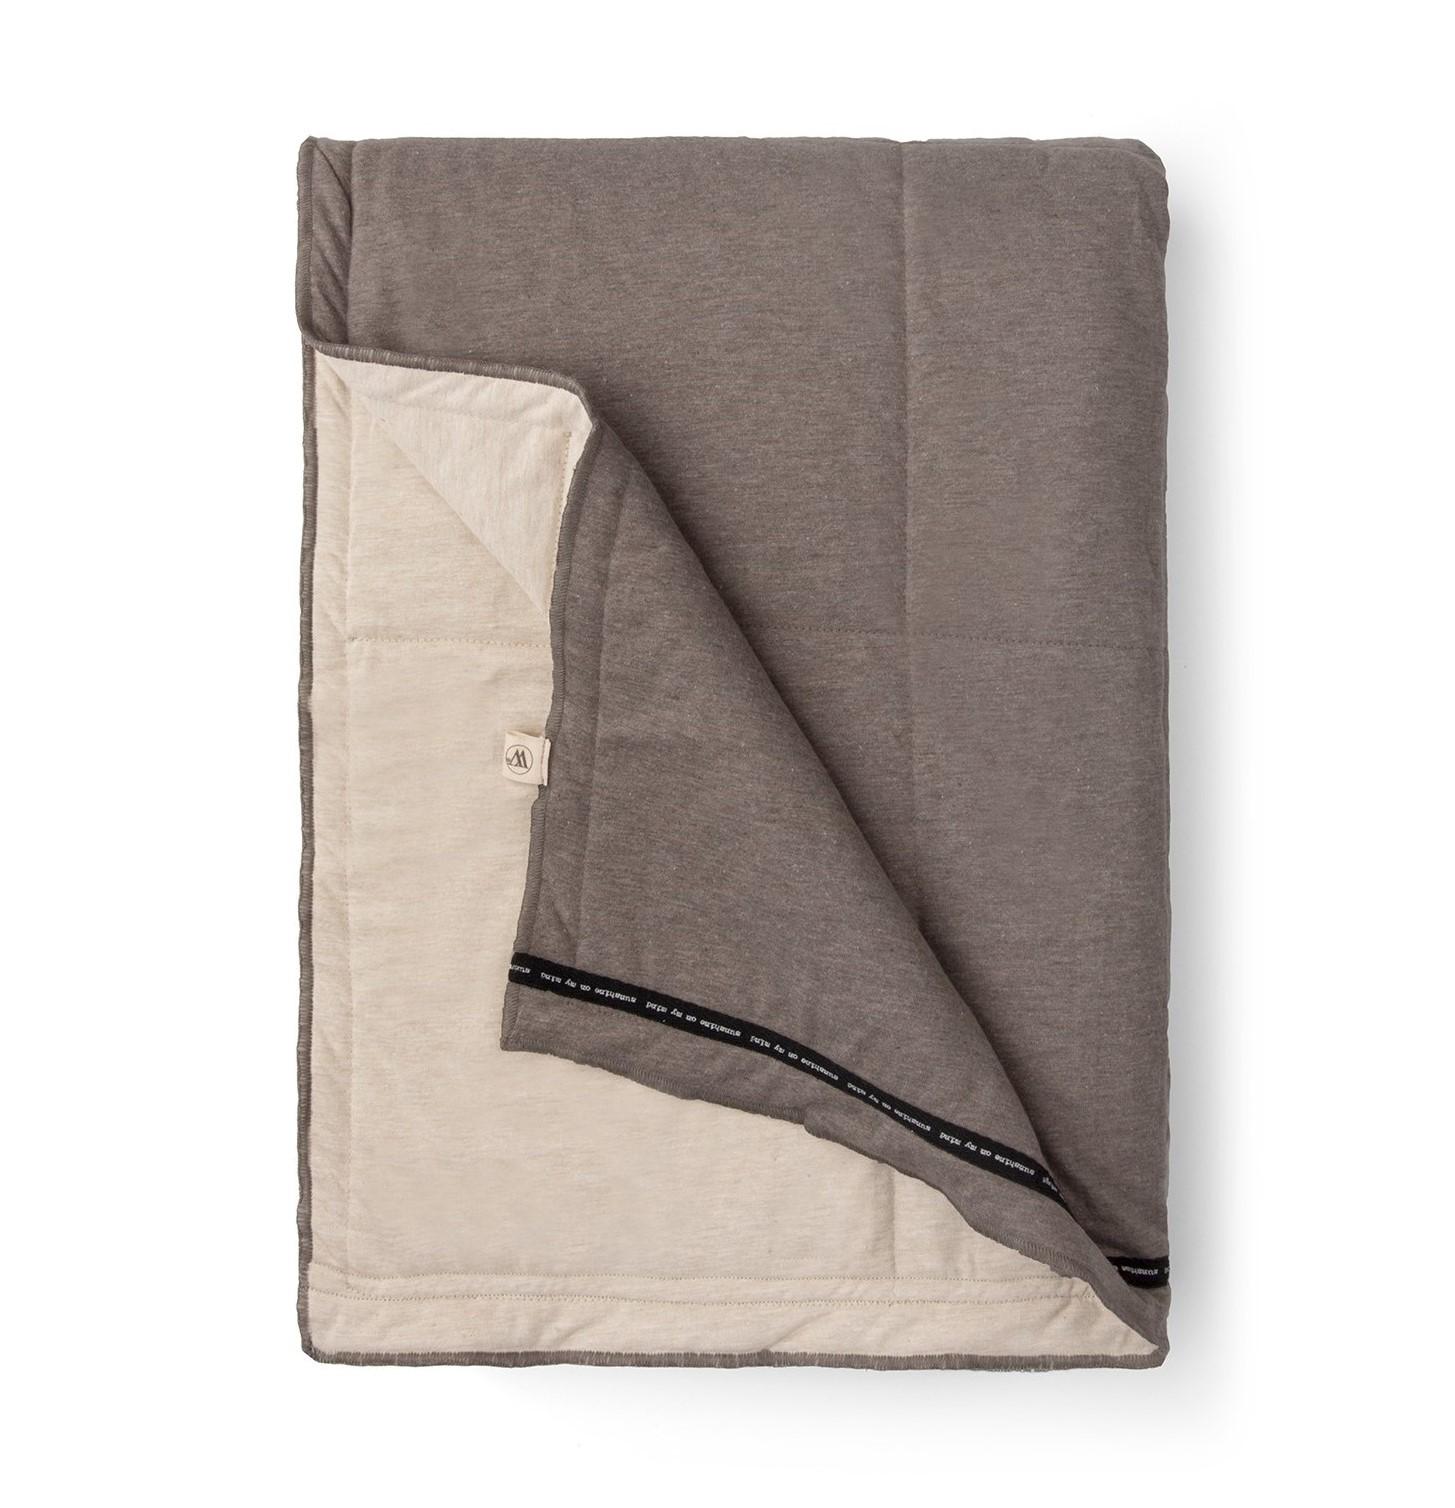 Plaid Walra Soft Jersey 130x180 cm Sand/Taupe